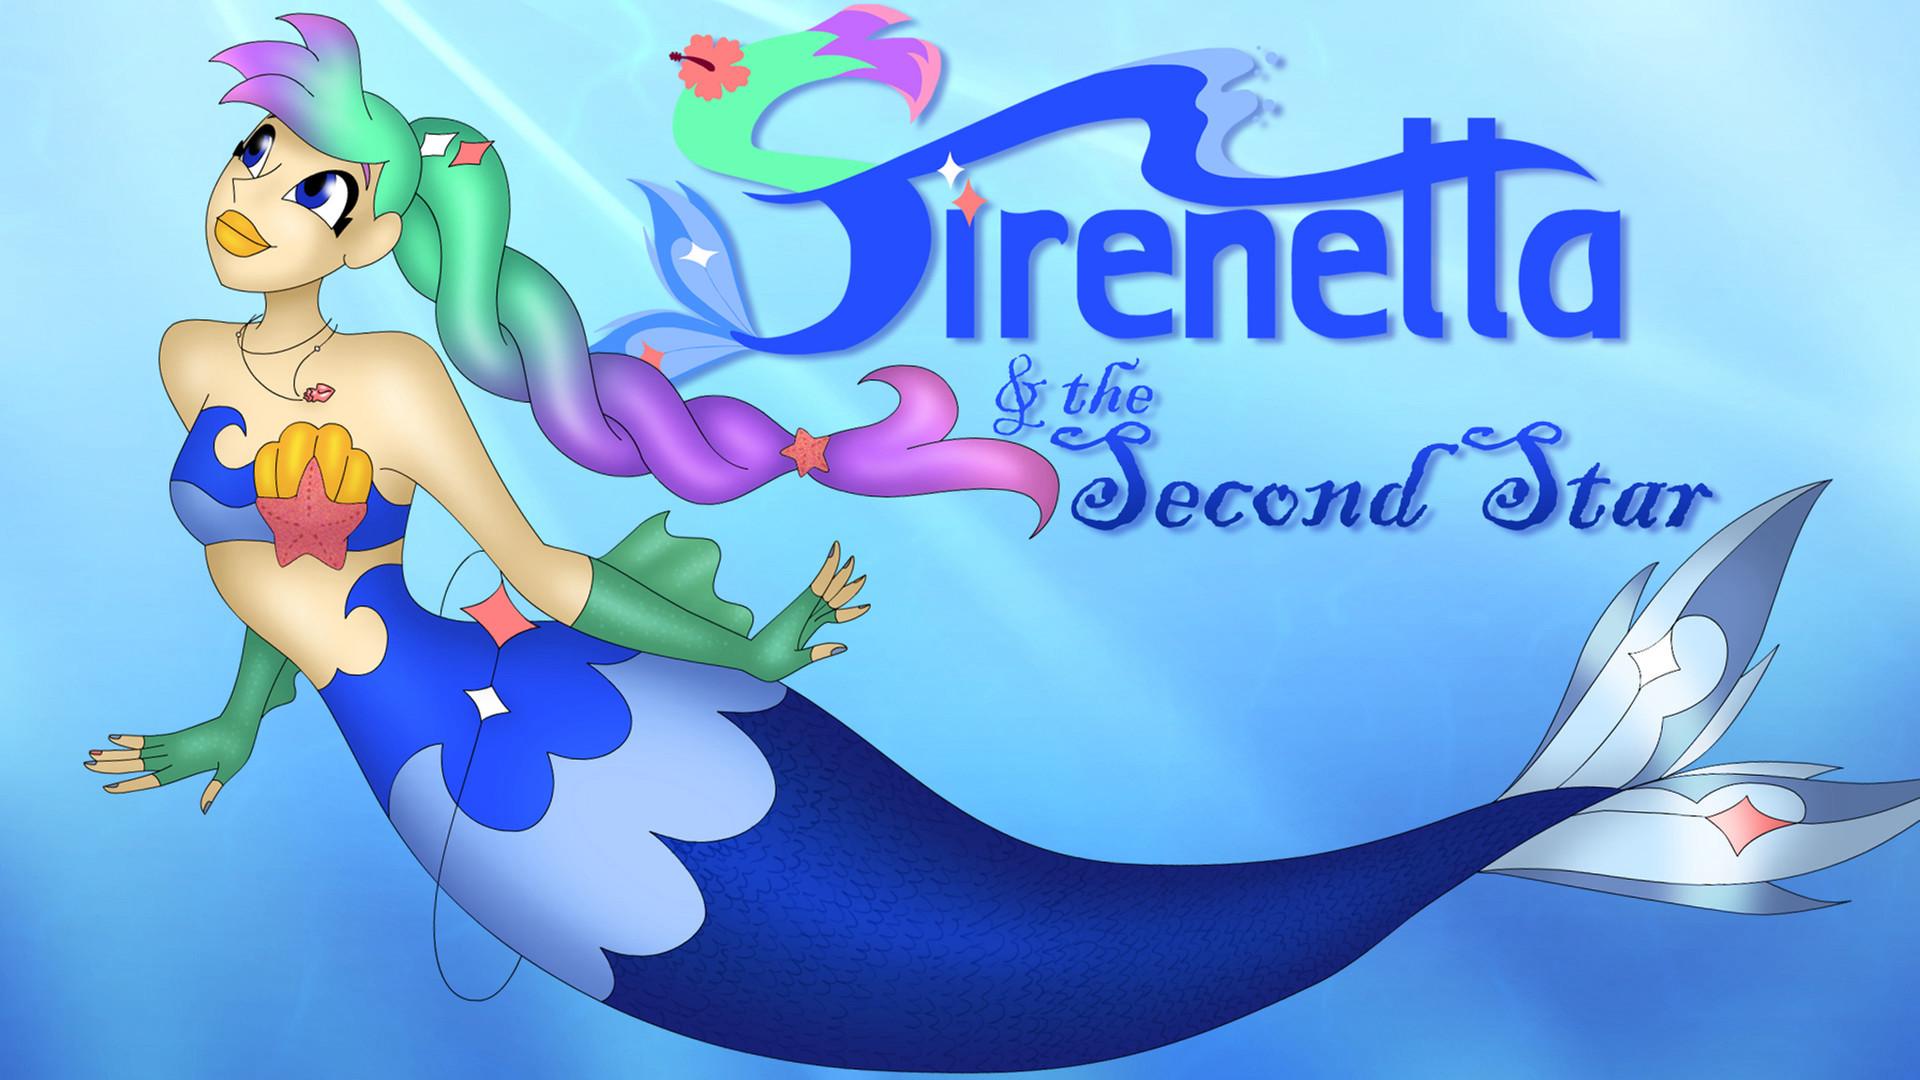 sirenetta_the_second_star